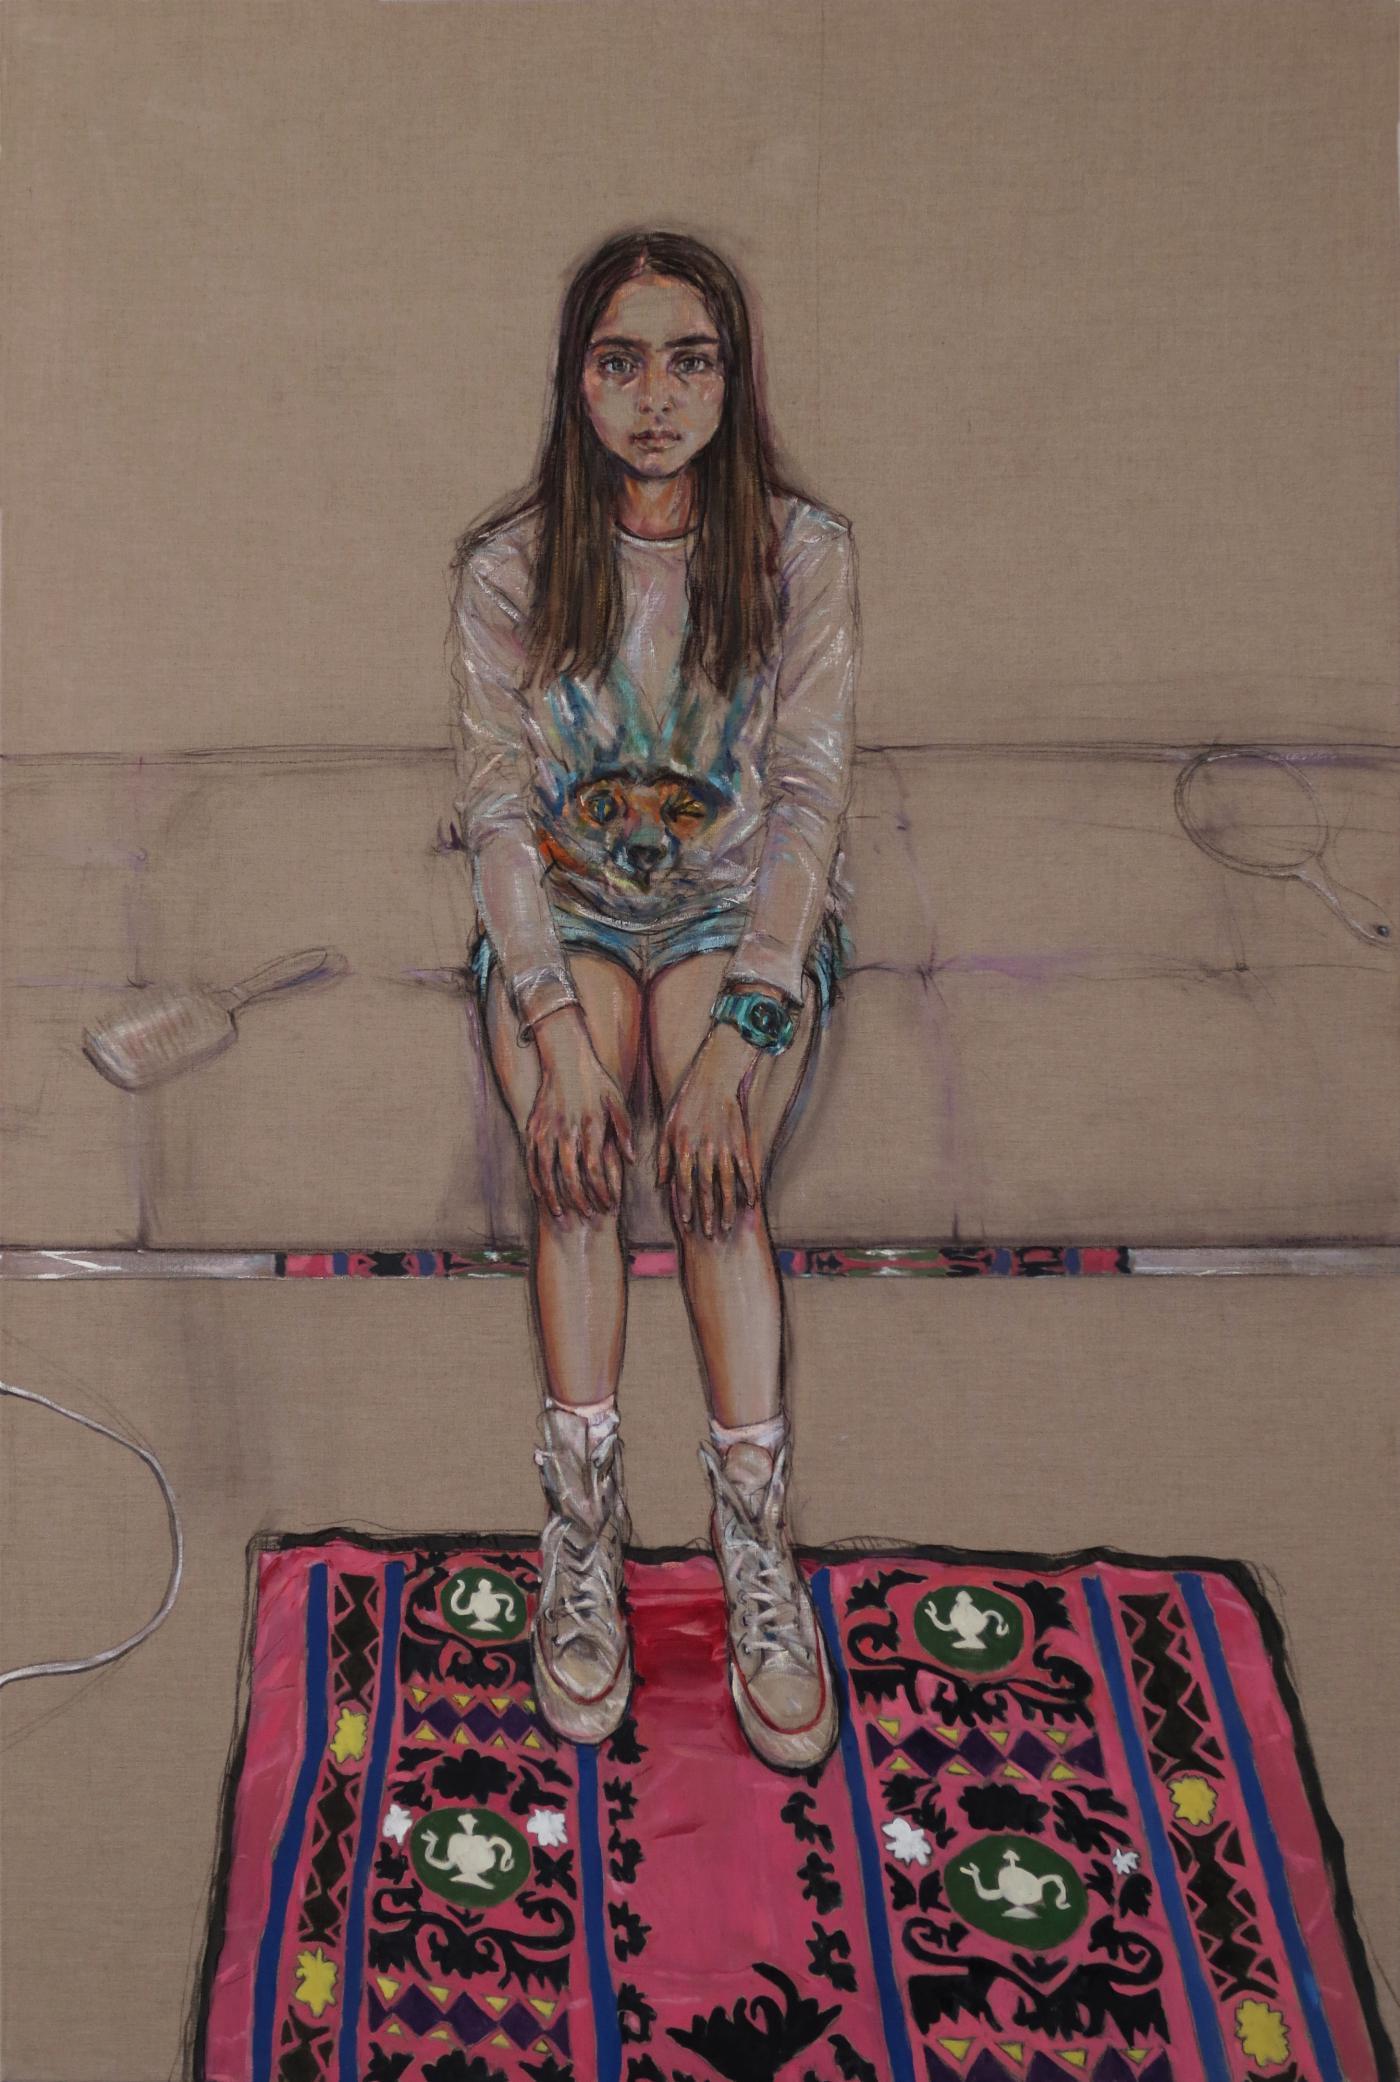 saffron-patel-aged-10